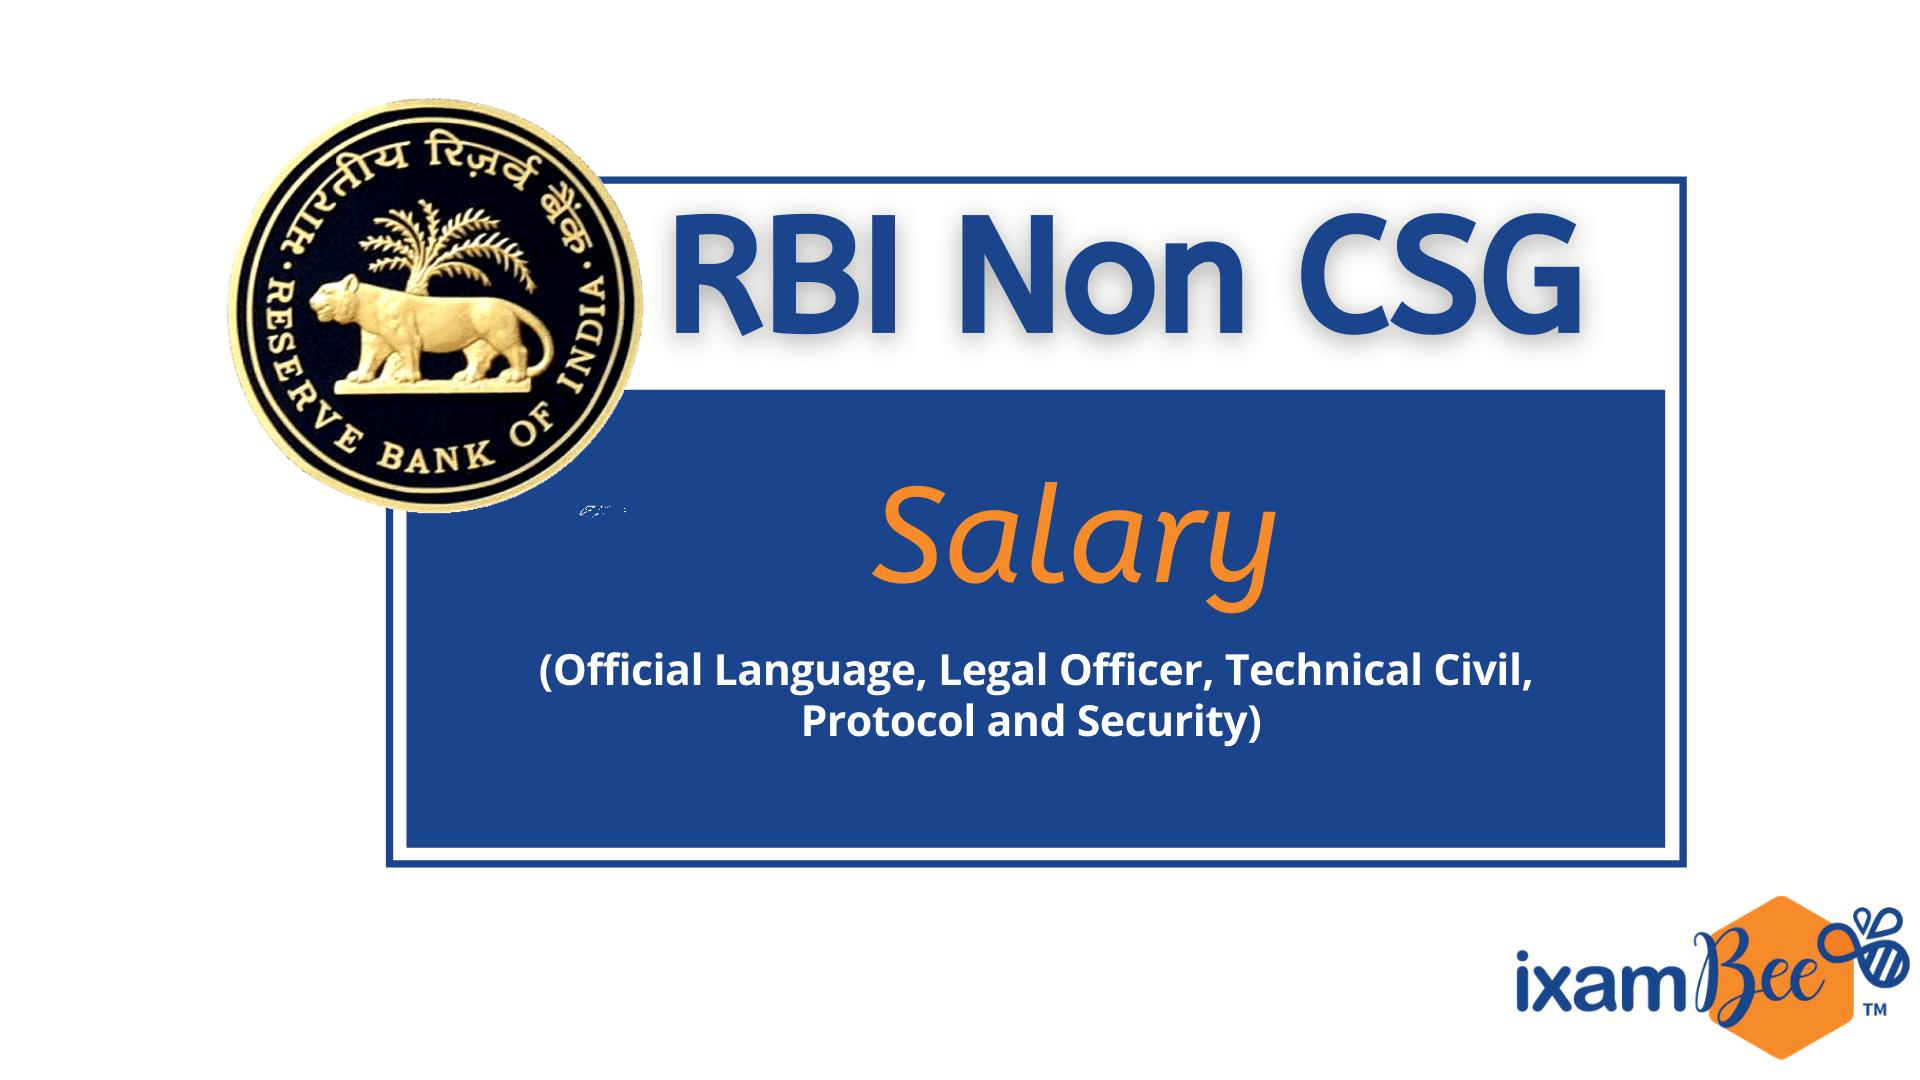 RBI Non CSG Salary 2021